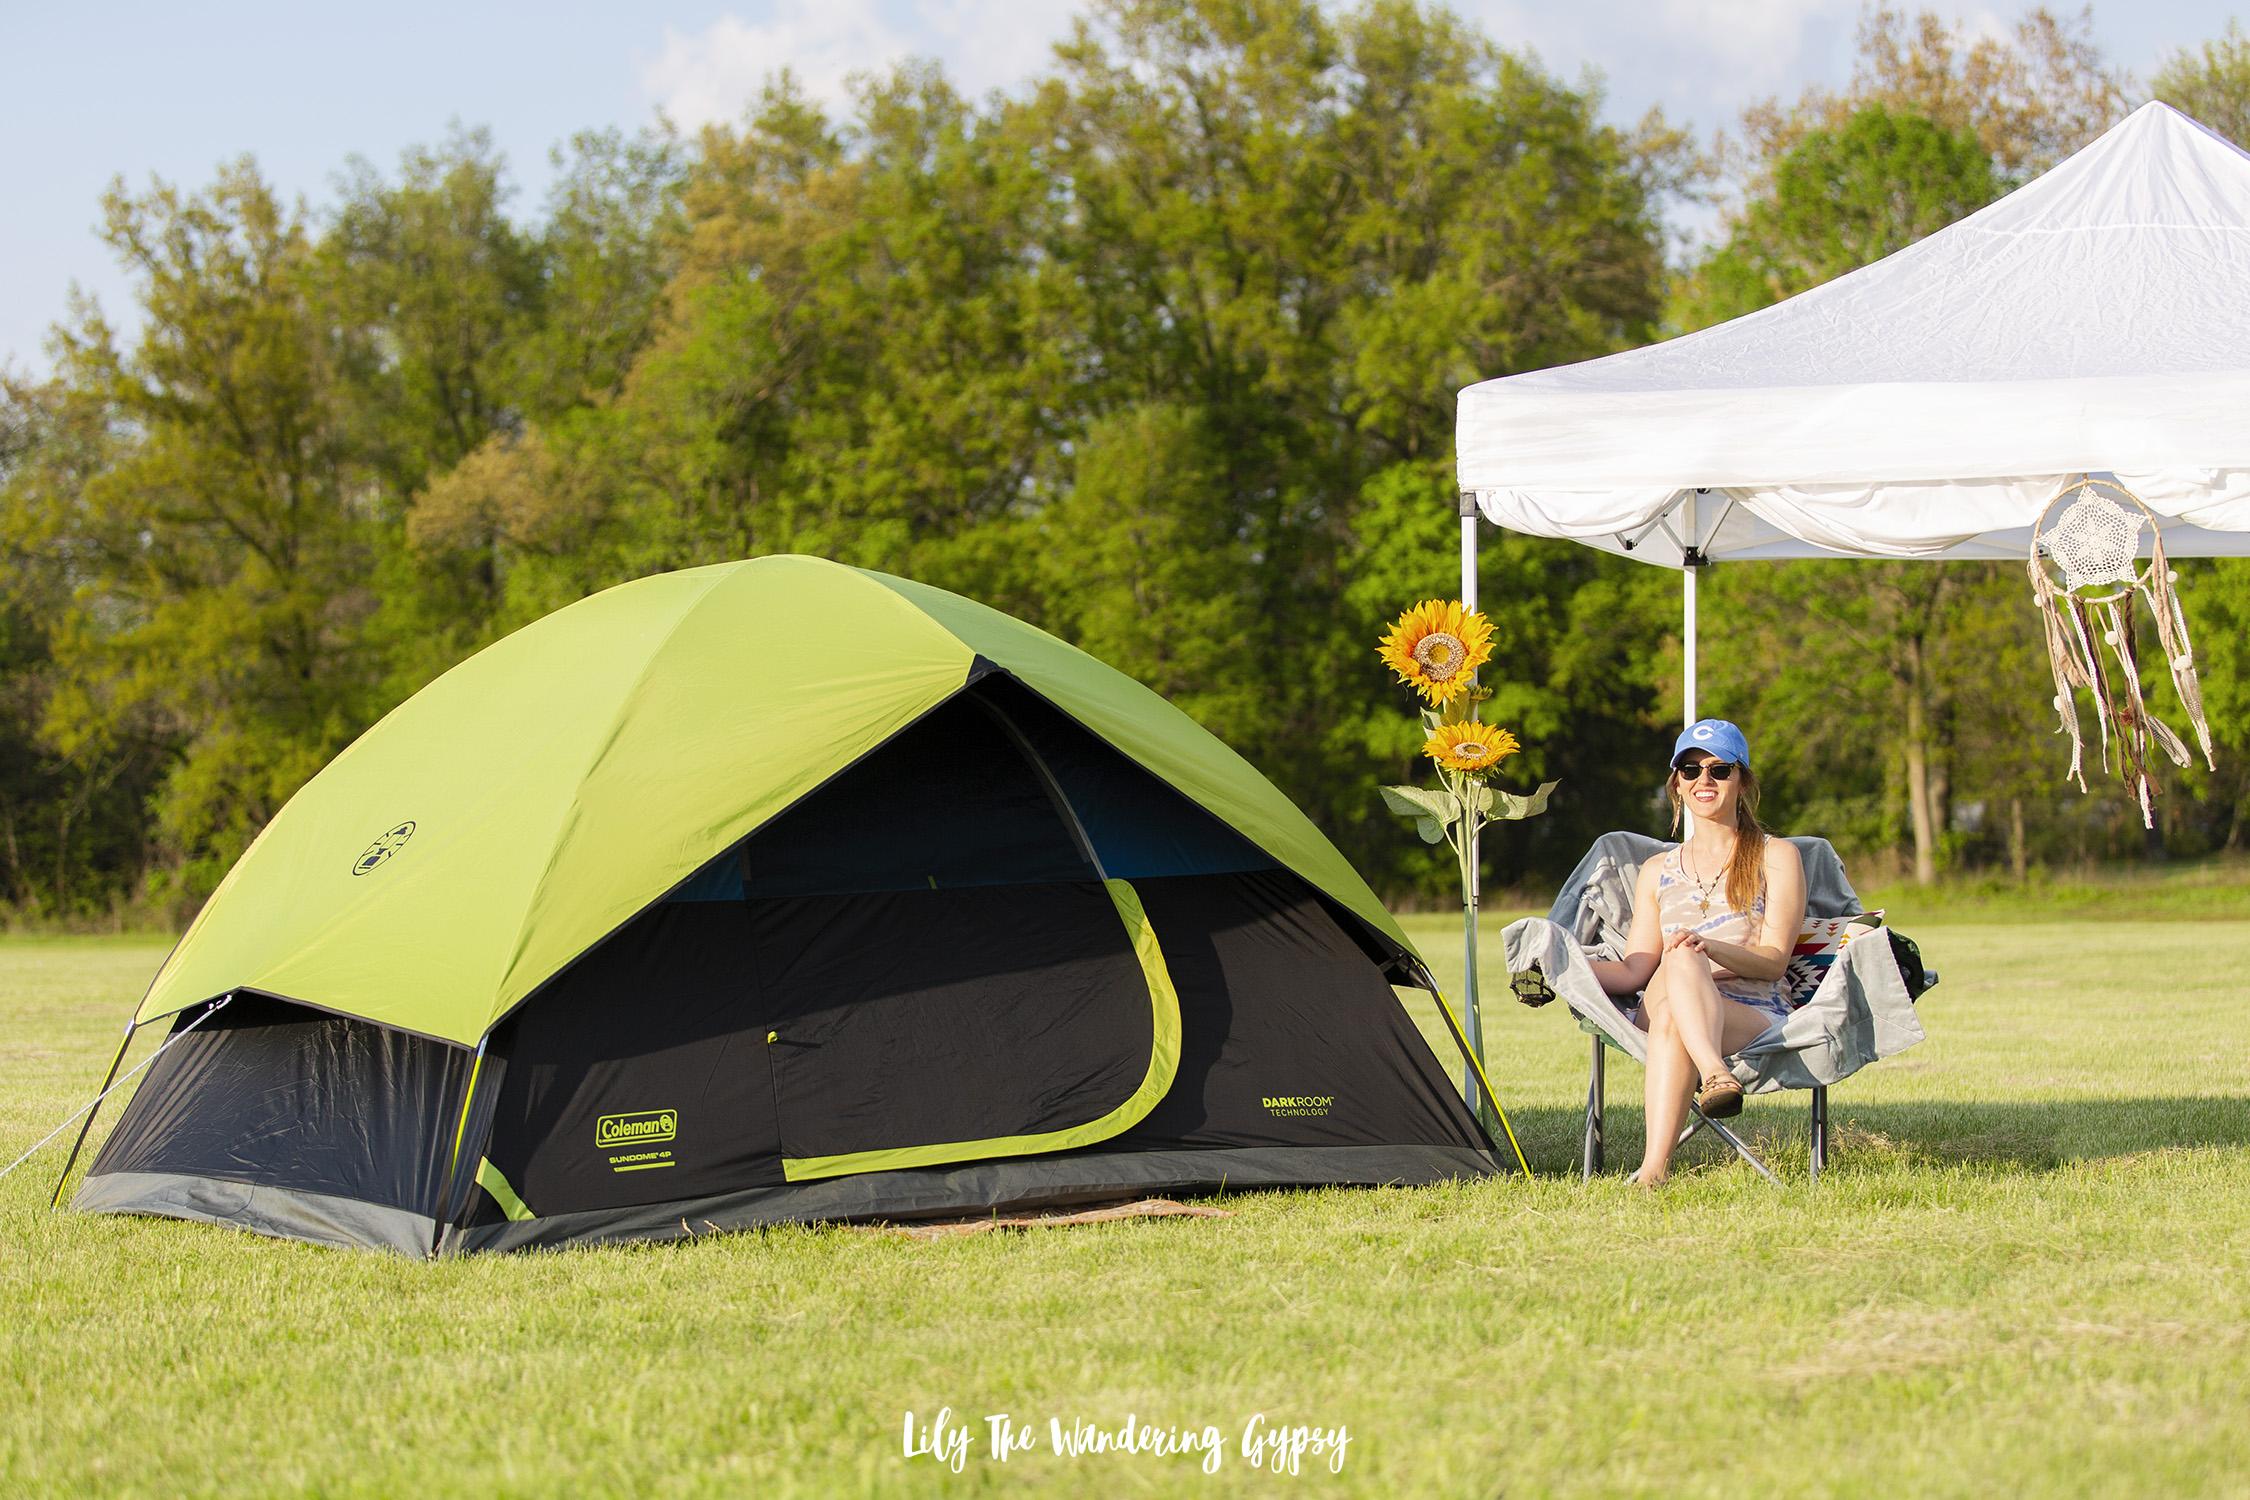 Coleman Darkroom Tent at Target #MusicFestival